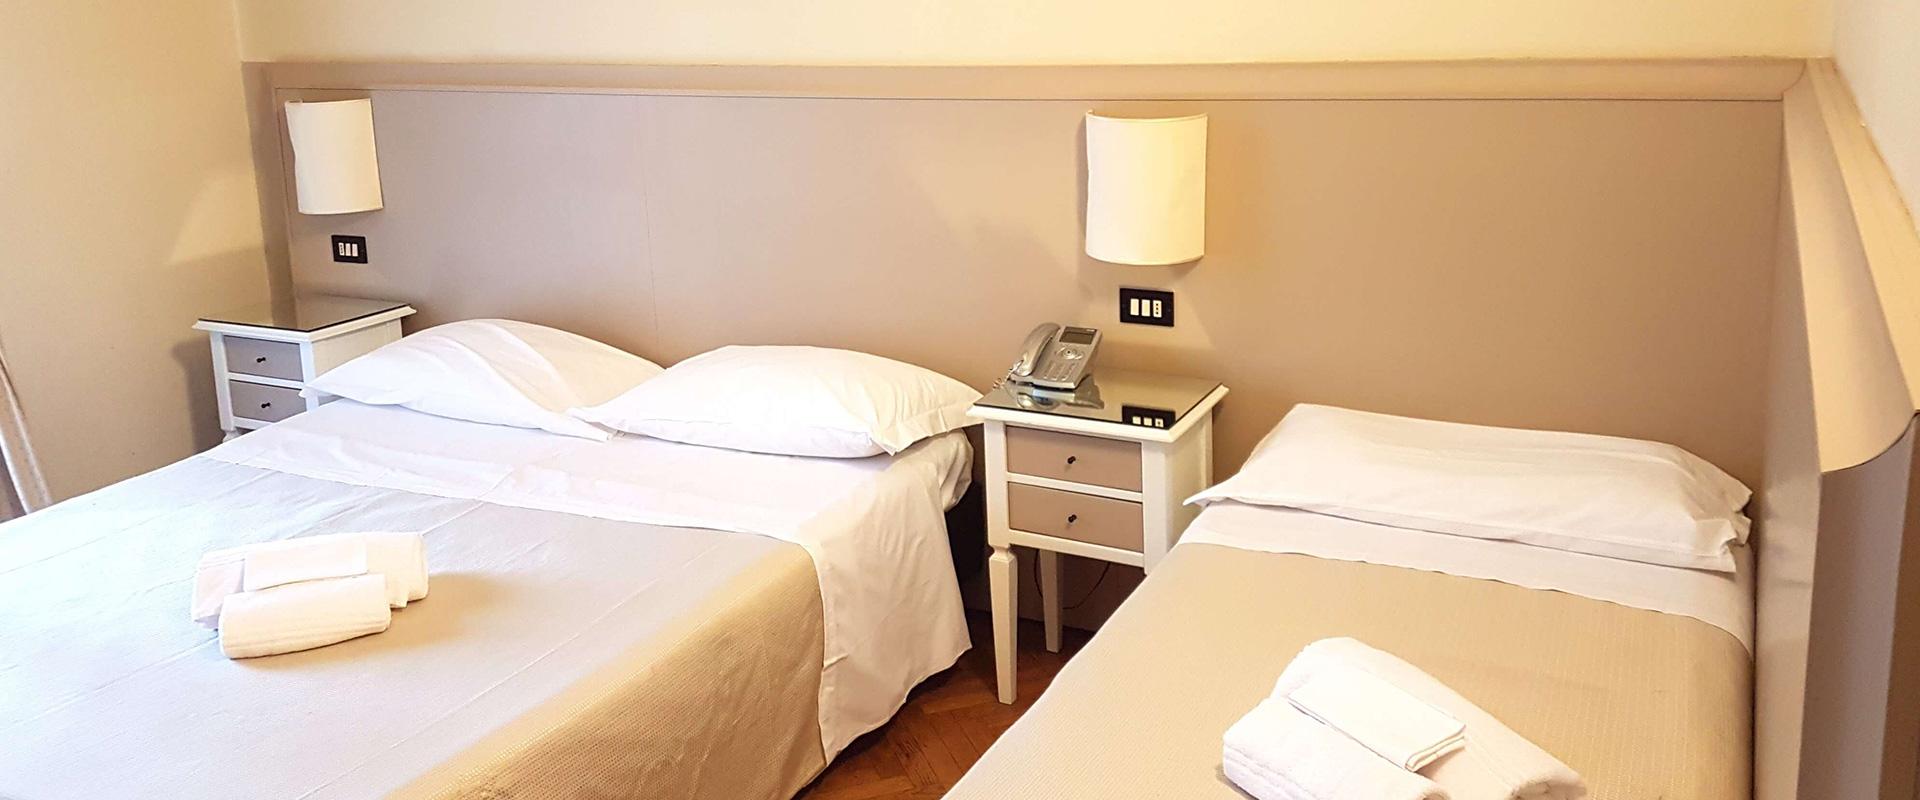 park-hotel-moderno-montecatini-terme